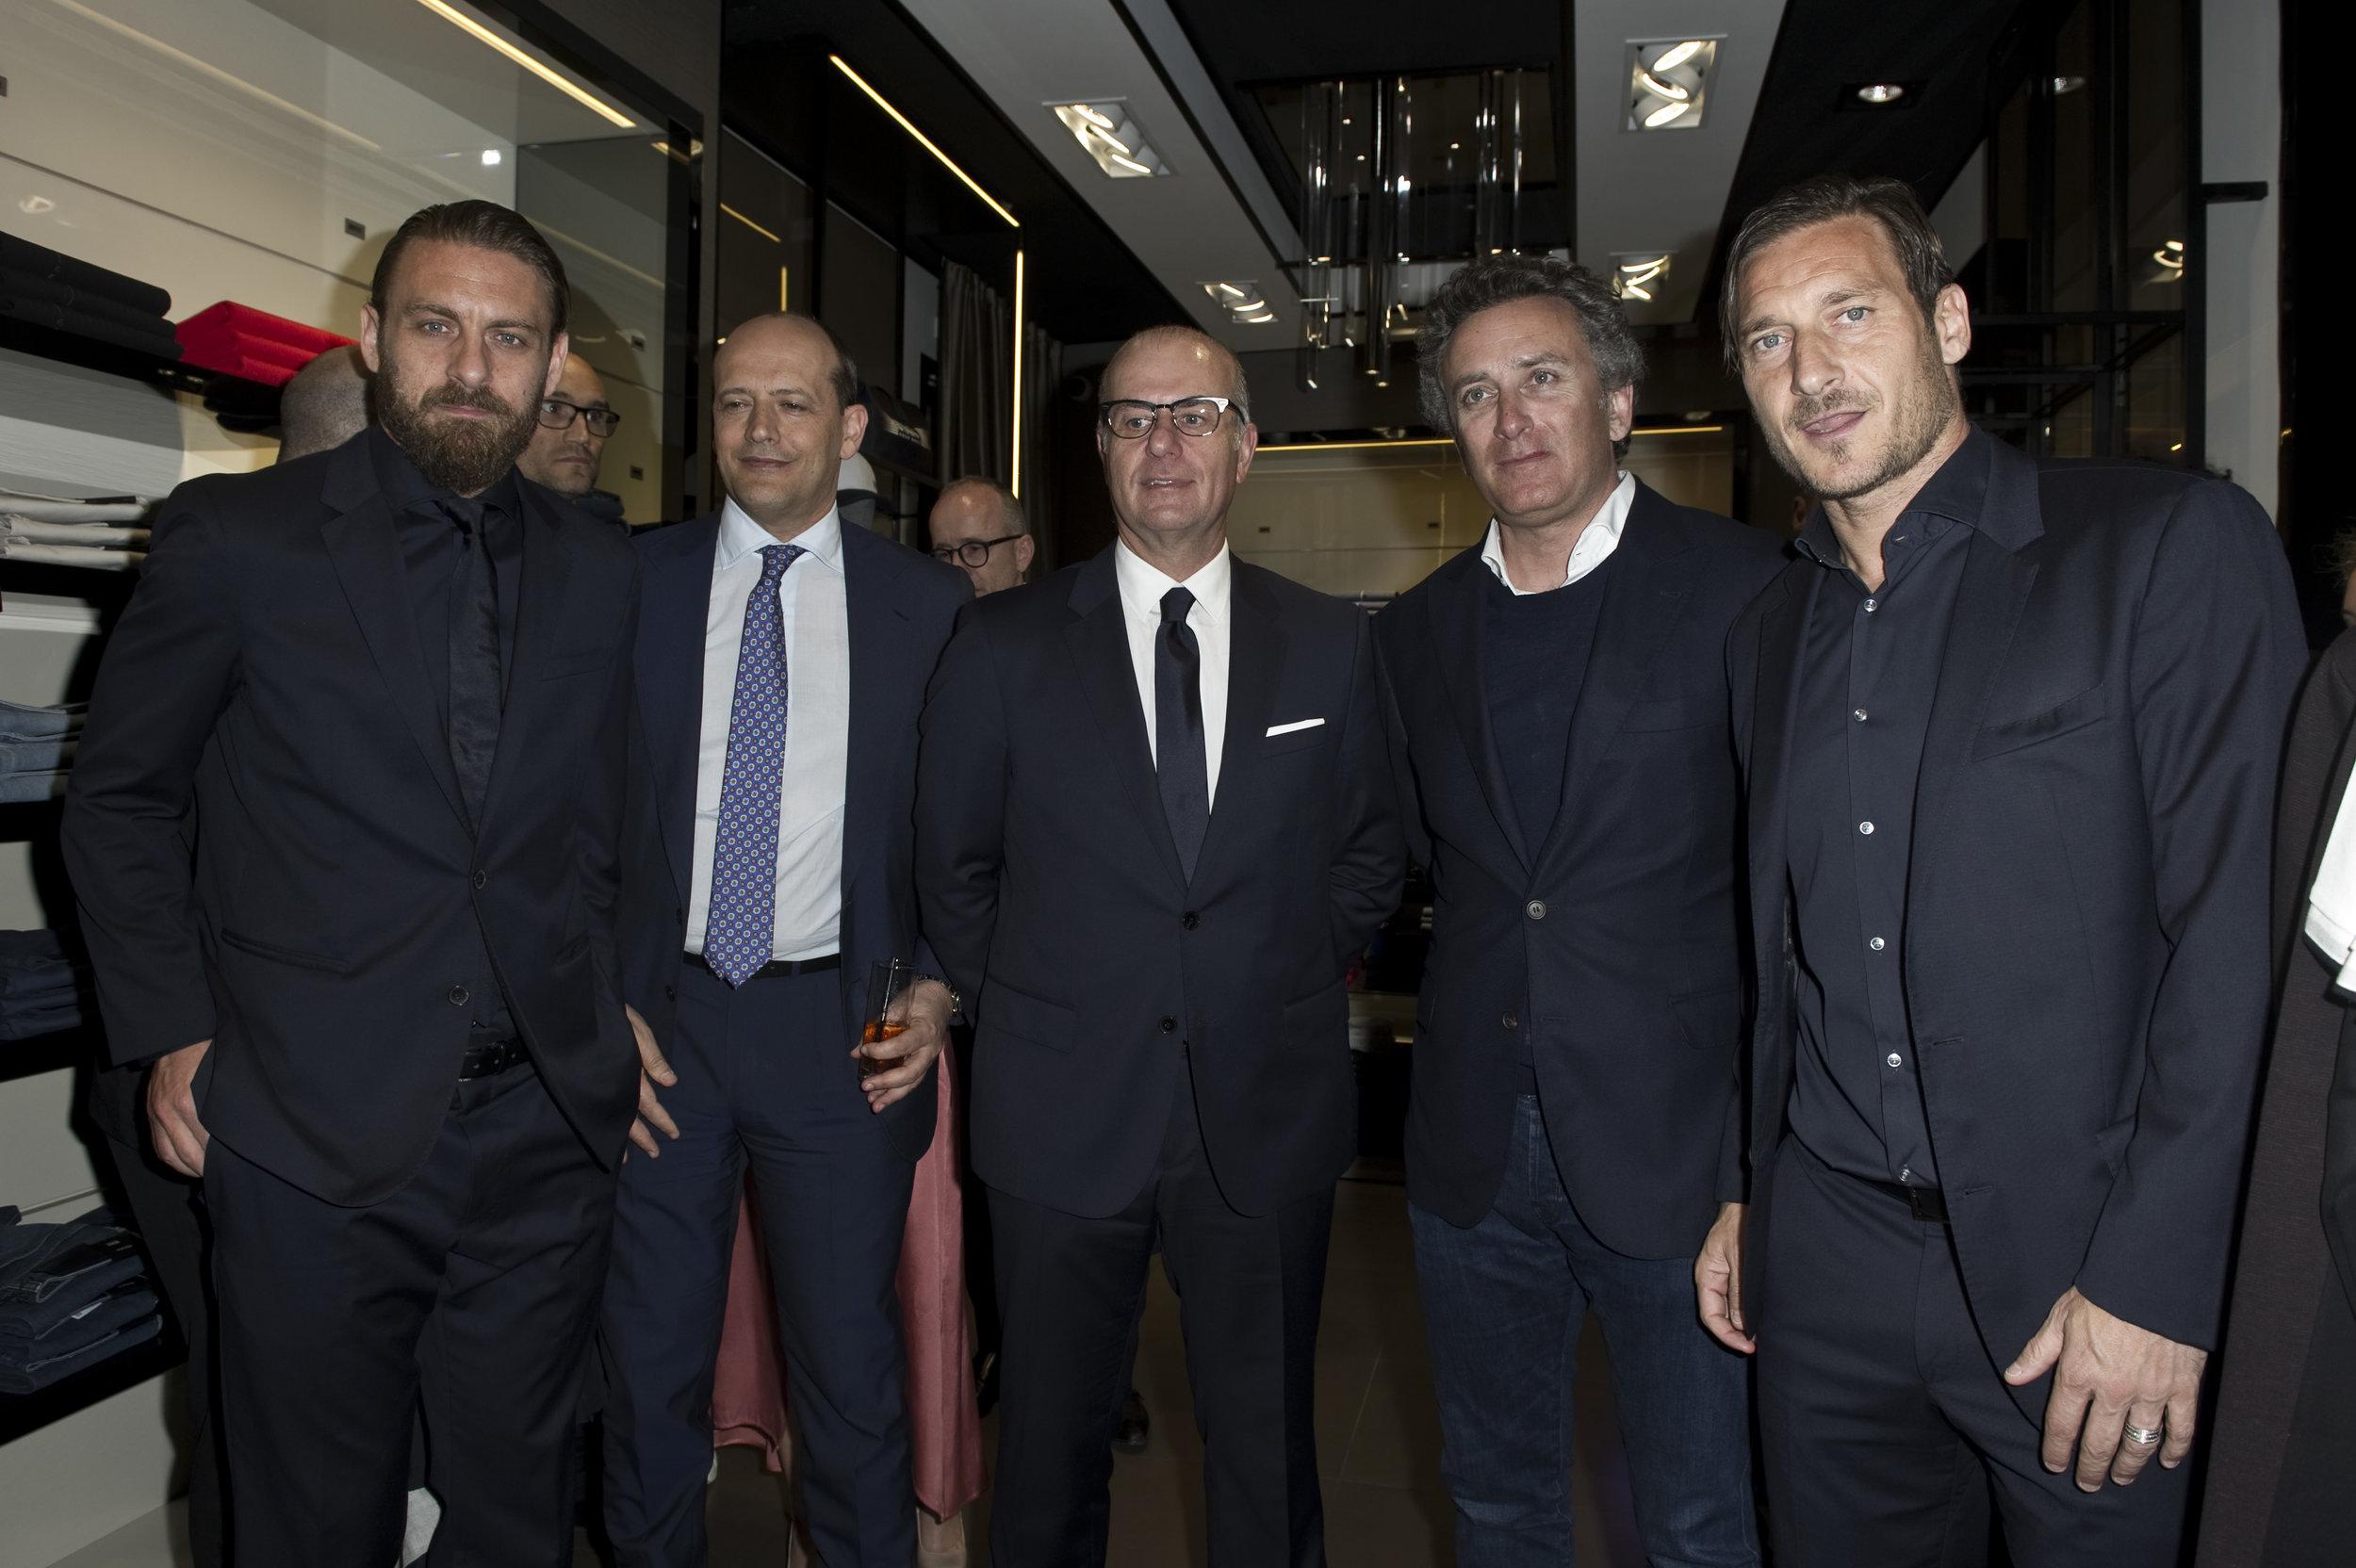 Daniele De Rossi; Mauro Baldissoni; Umberto Gandini; Alejandro Agag; Francesco Totti.jpg